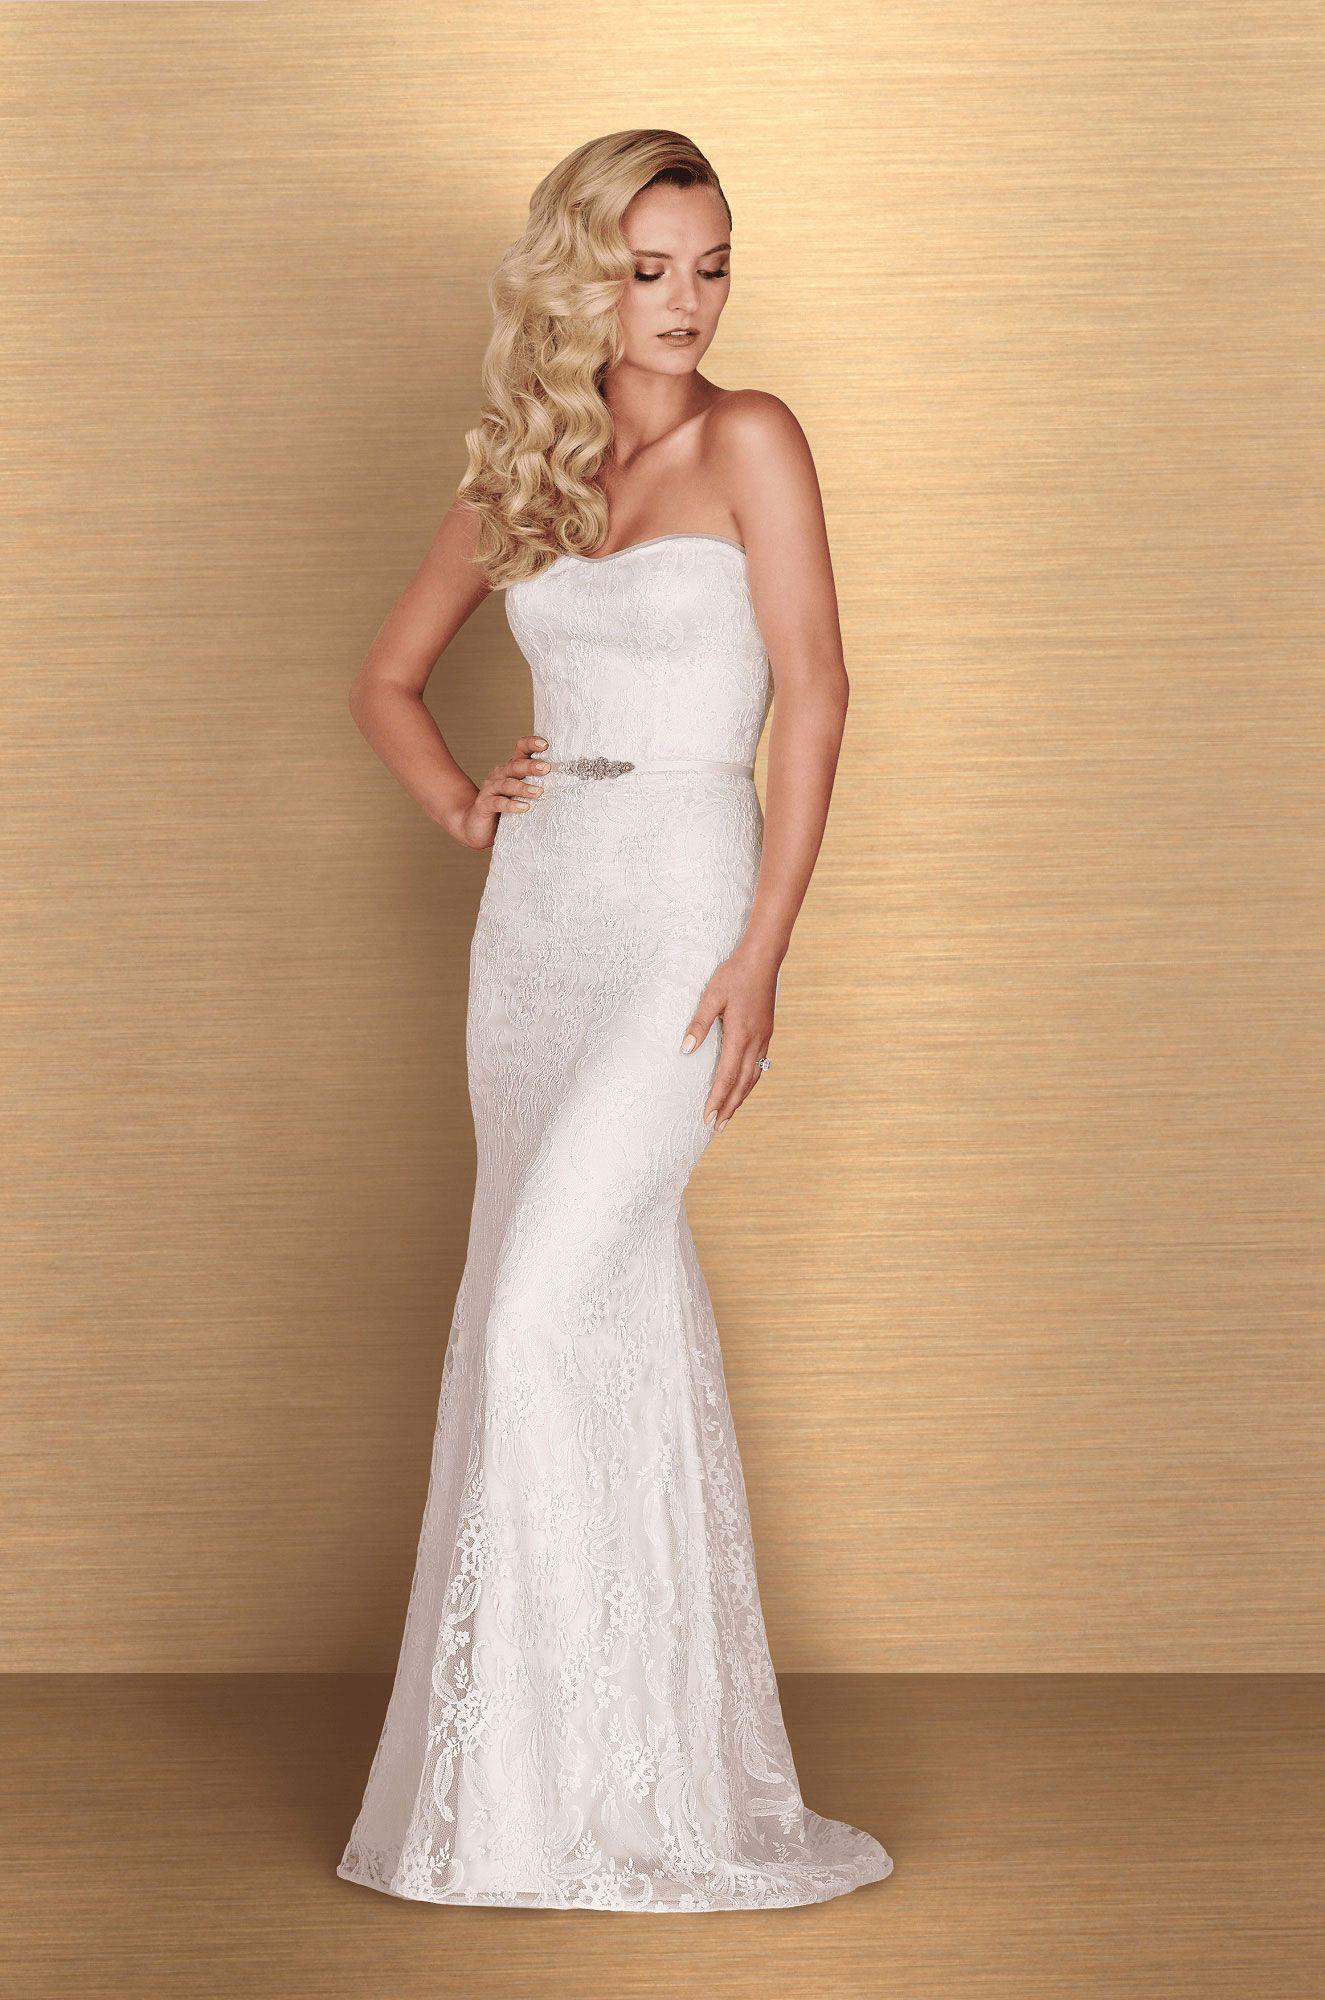 Strapless lace wedding dress style pinterest paloma